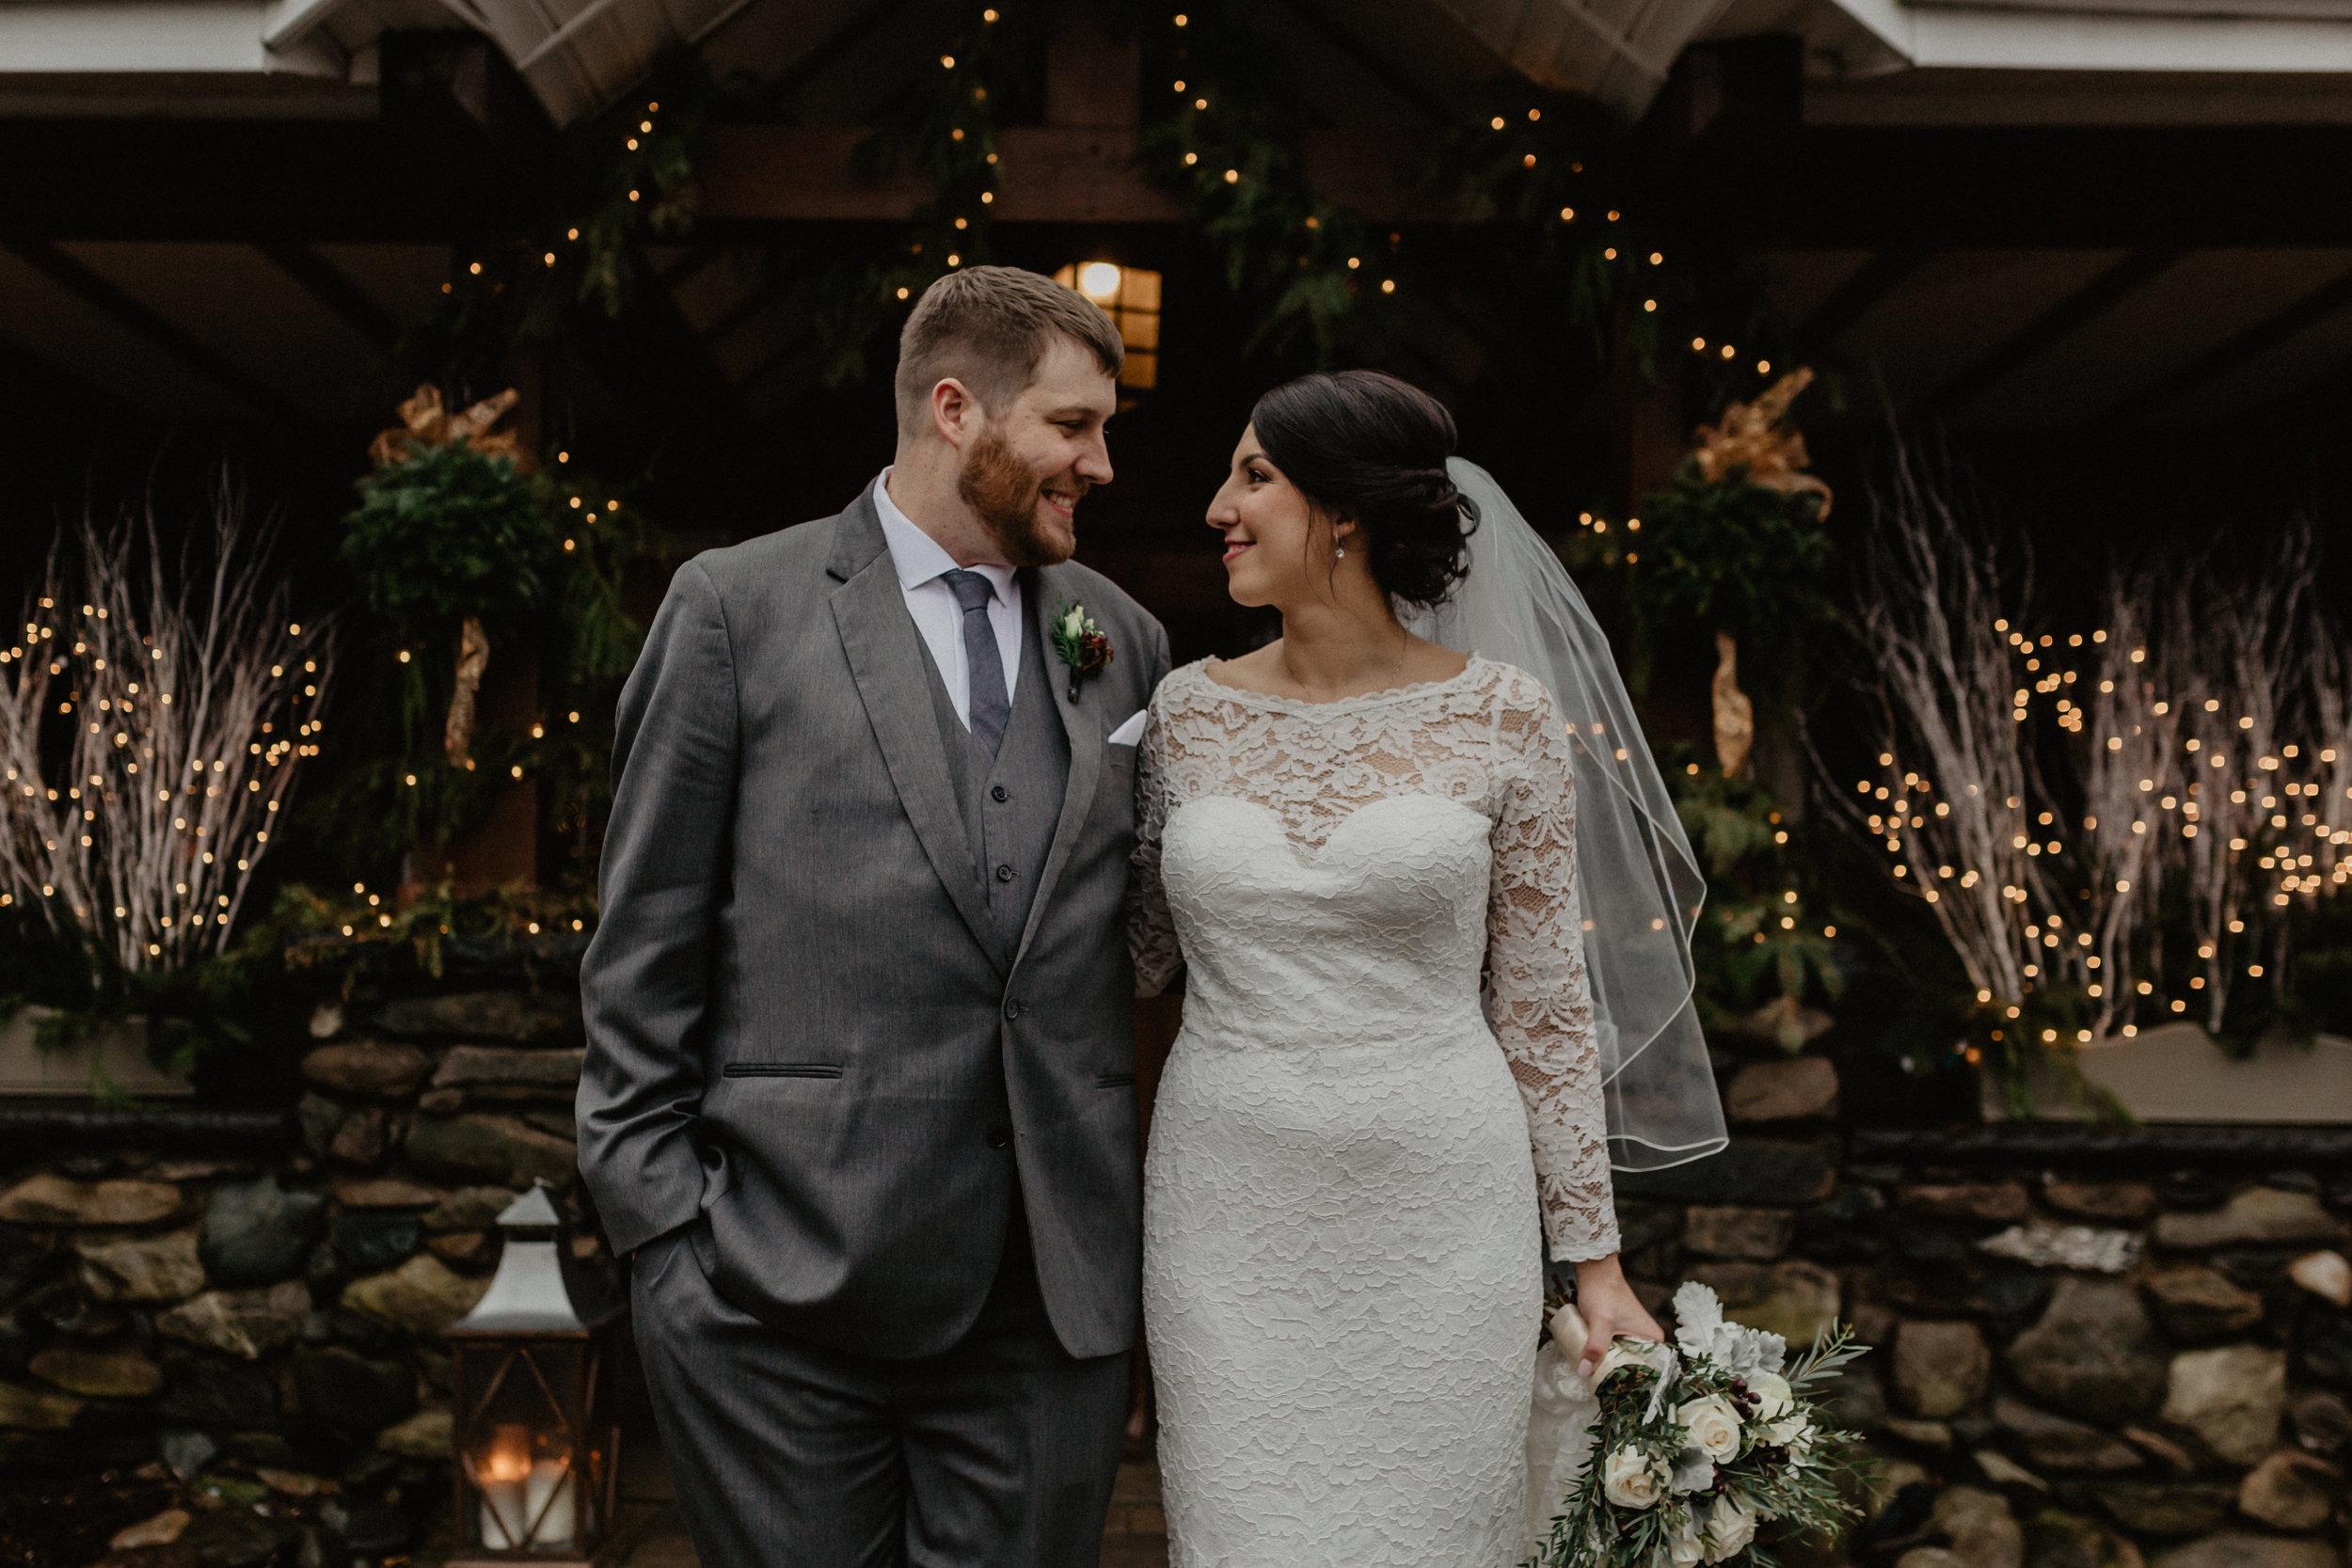 old_daley_on_crooked_lake_wedding_034.jpg